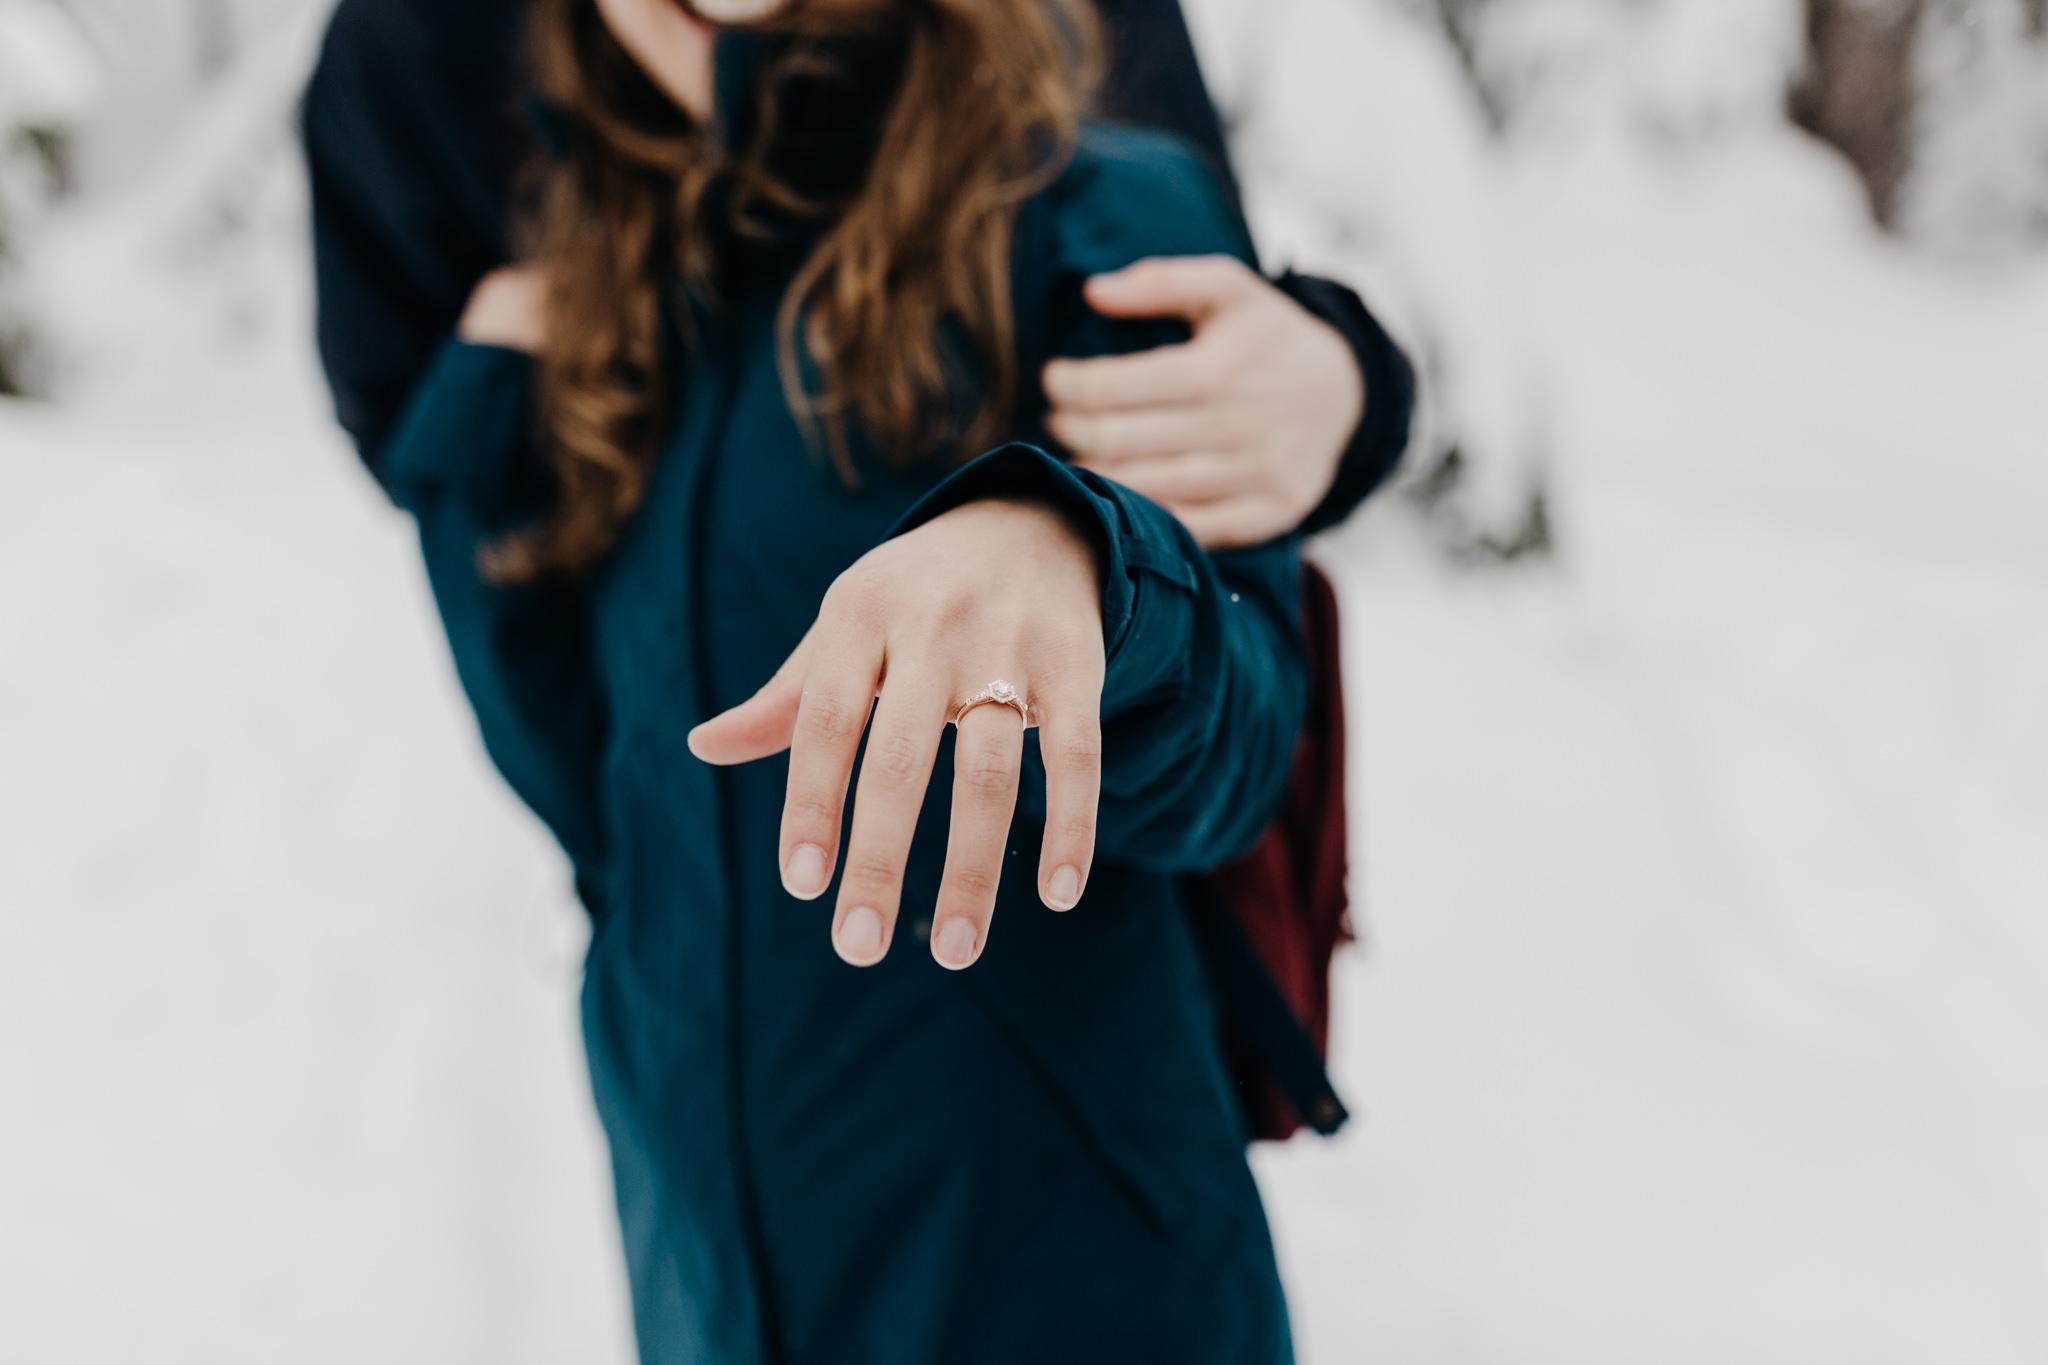 greg+jade-mount-washington-winter-engagement046.JPG